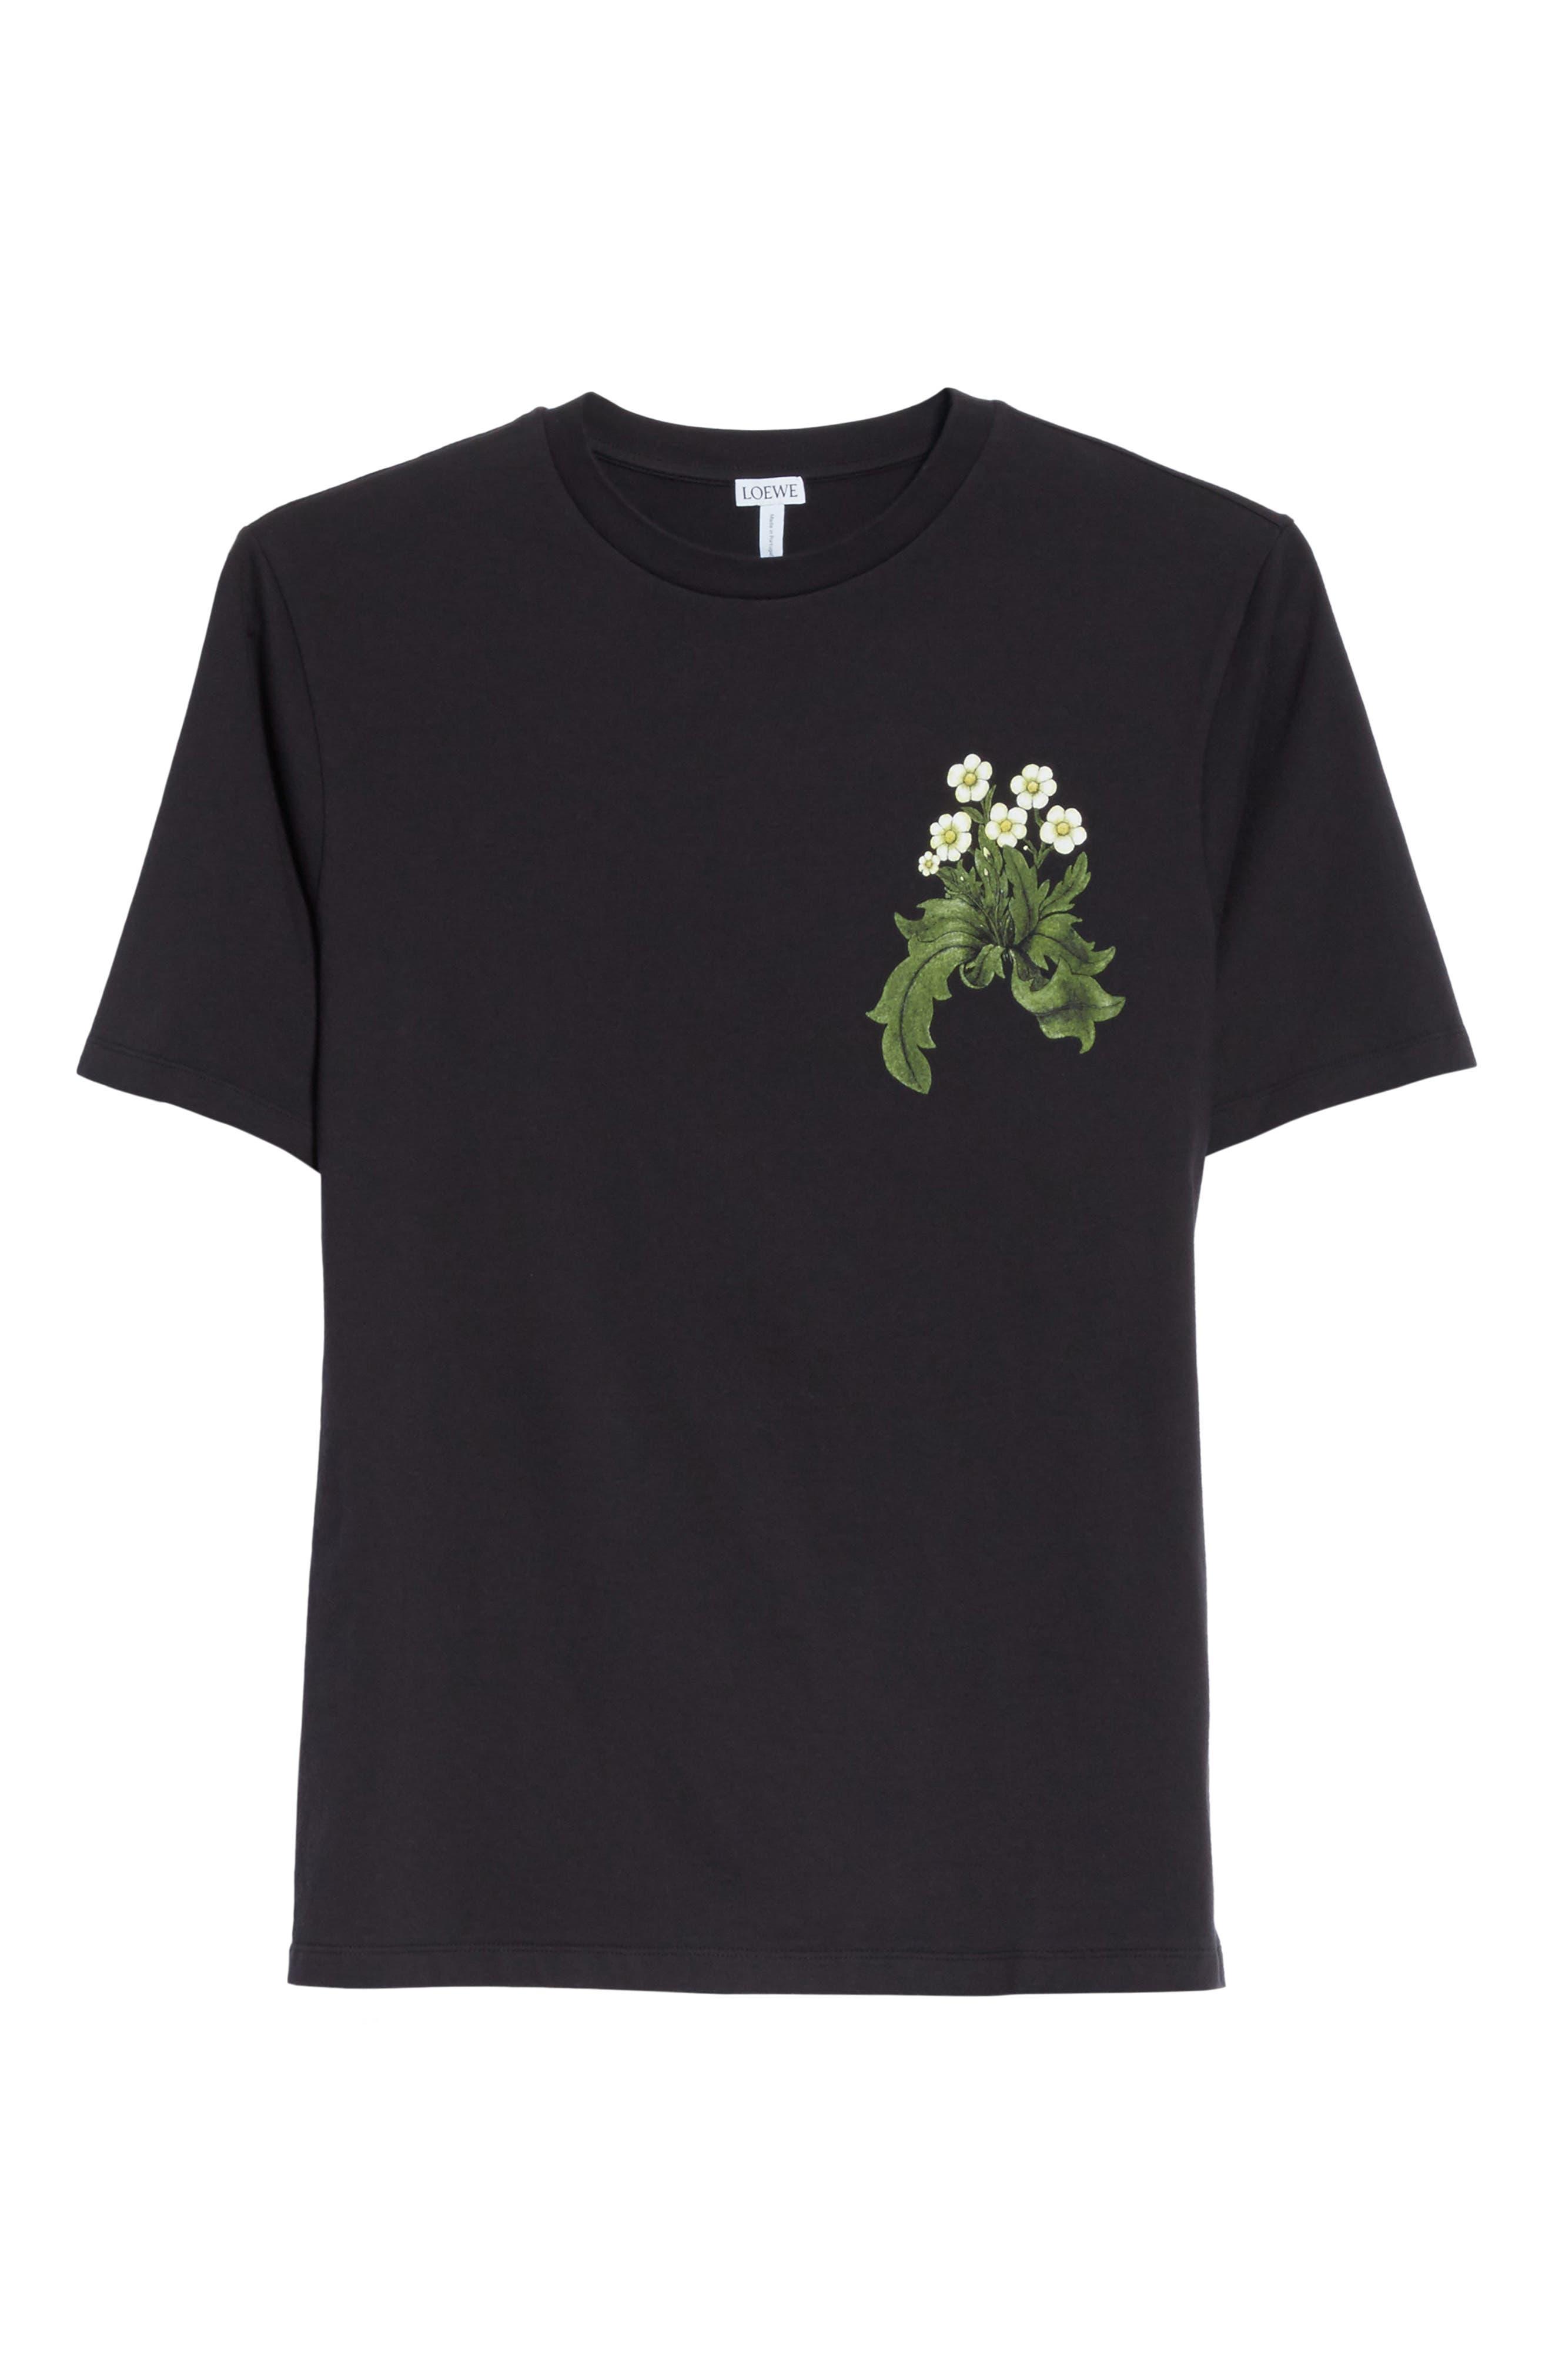 Loewe & Co. Graphic T-Shirt,                             Alternate thumbnail 6, color,                             001